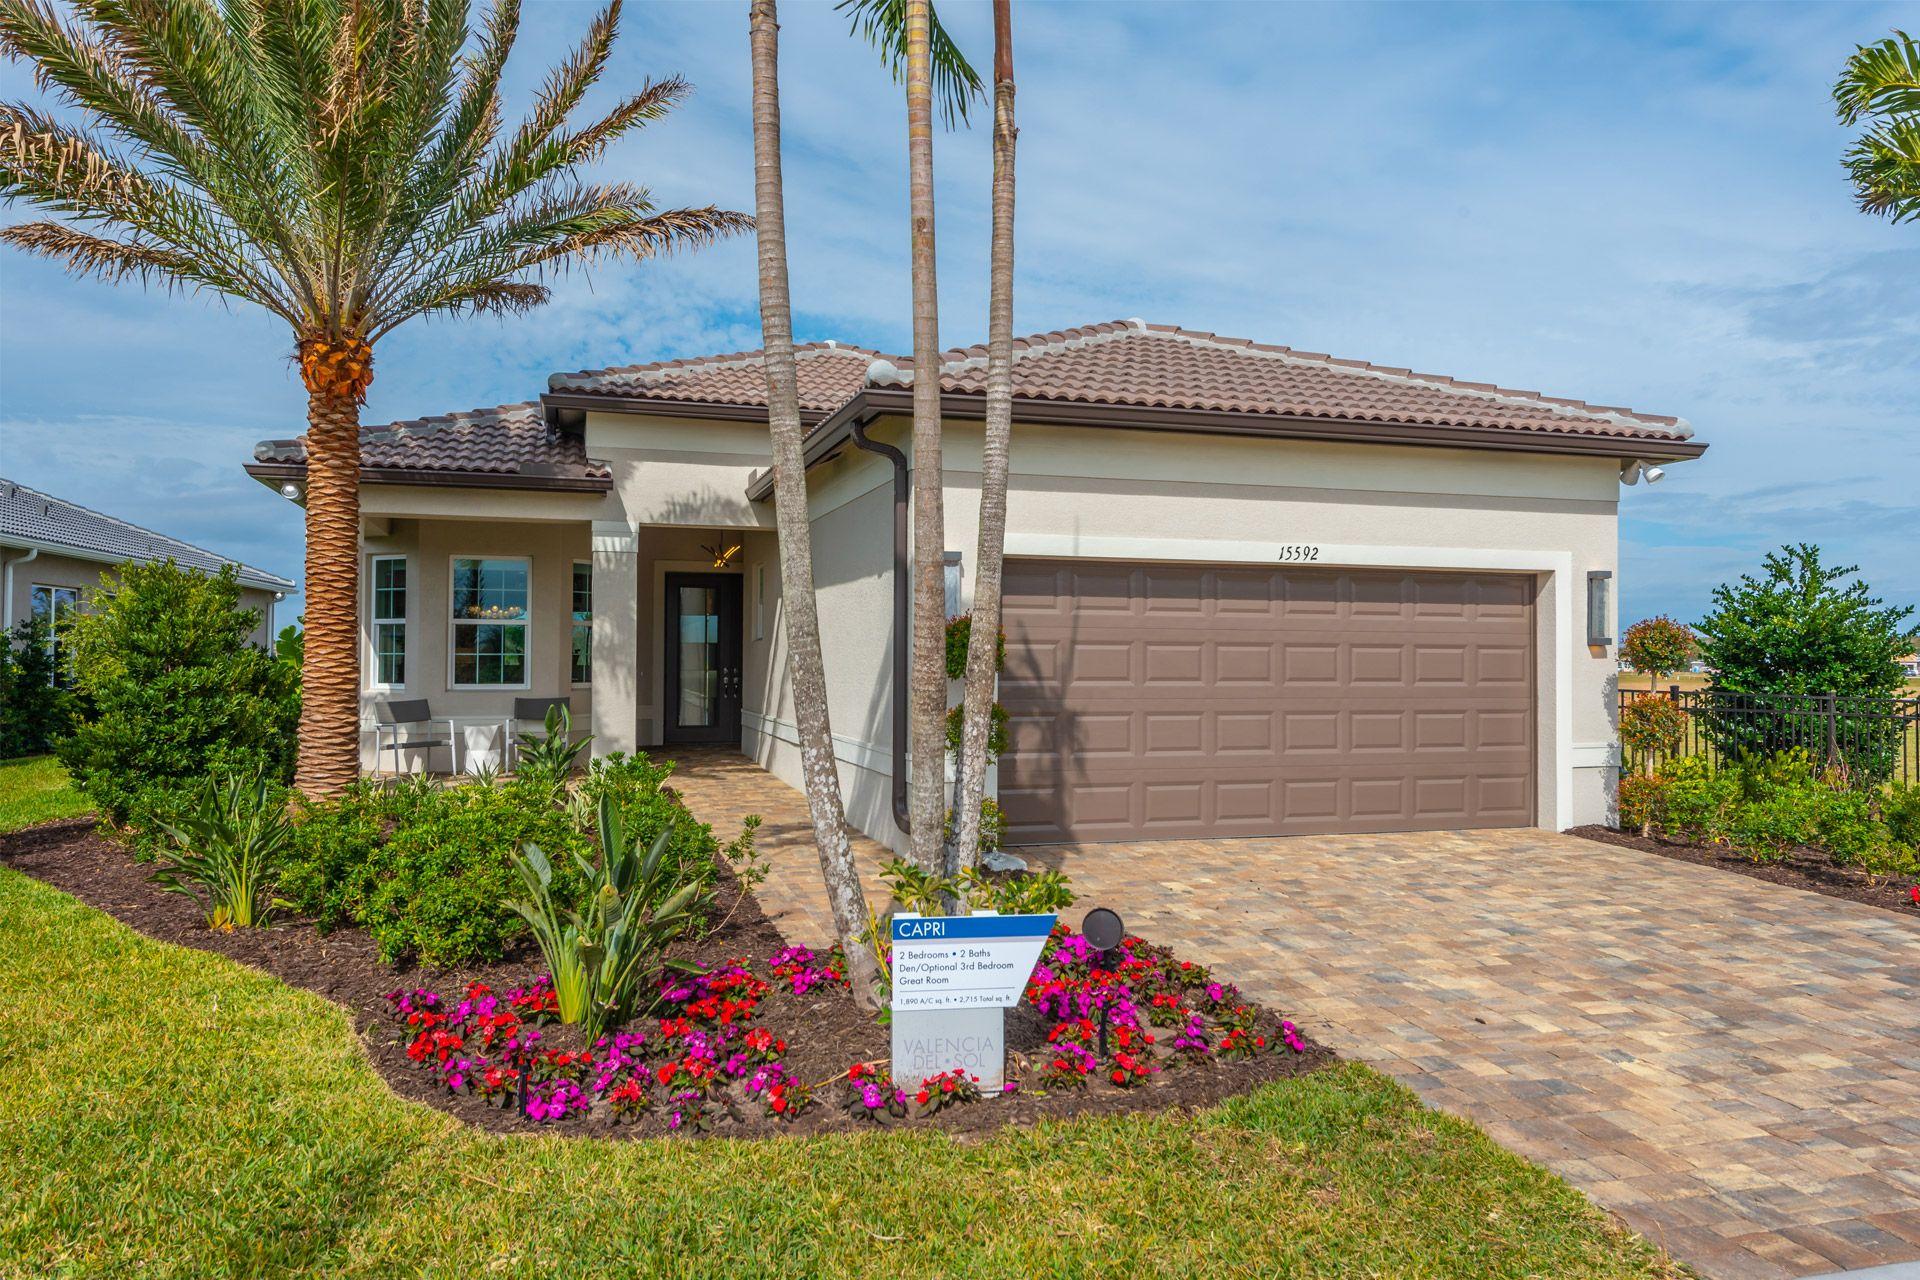 Soak Up The Florida Sunshine At Valencia Del Sol Tampa S Hottest New 55 Community Florida Homes For Sale Florida Real Estate Florida Home